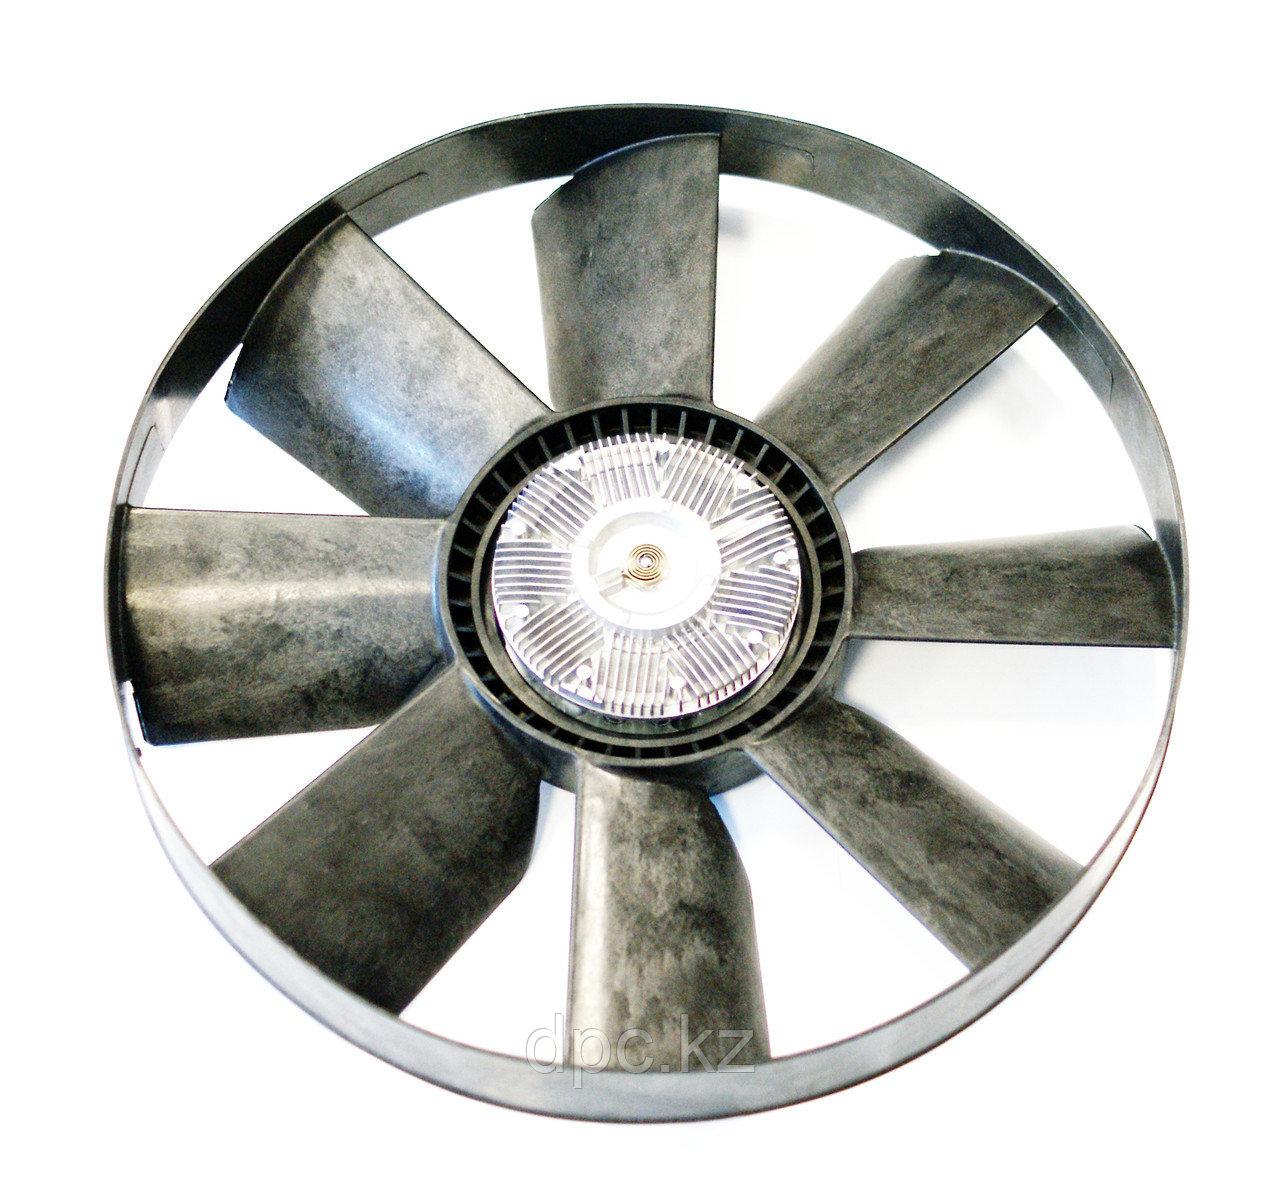 Вентилятор с муфтой D-654 для Cummins ISBe КАМАЗ 740.30-260, 740.30, 740.31 020002741